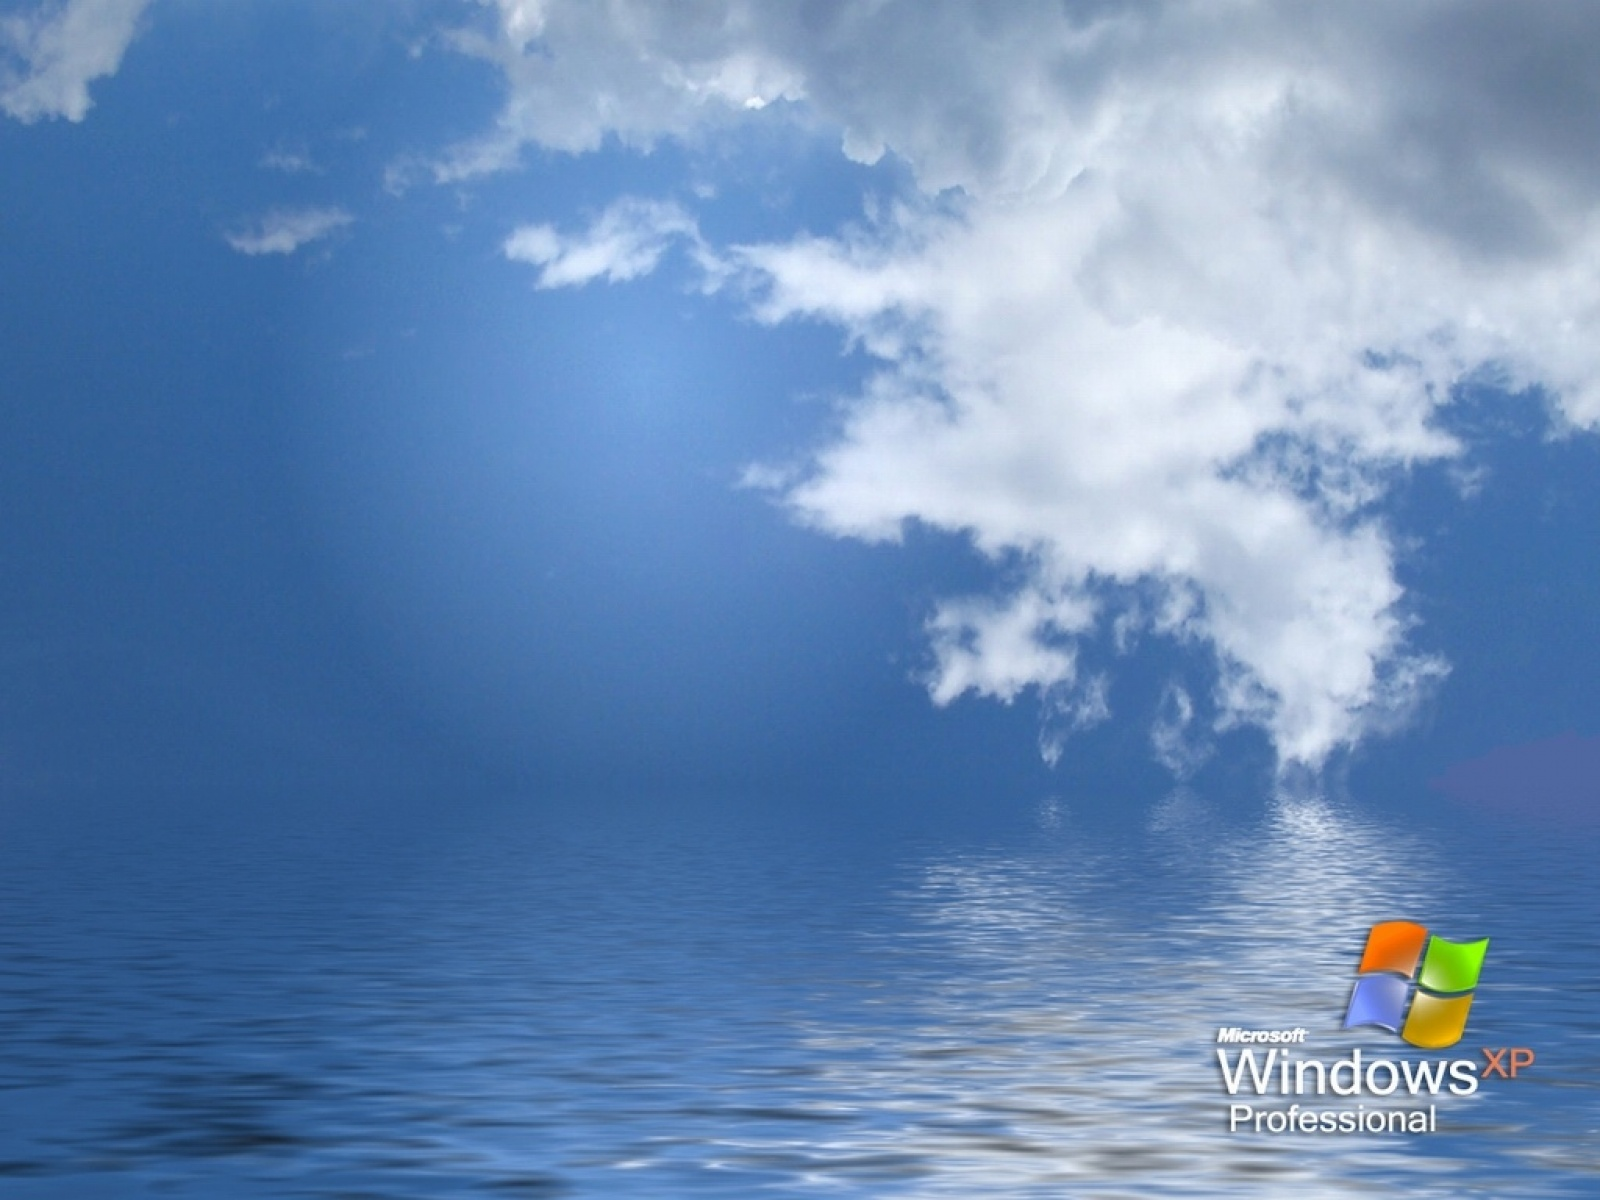 Windows xp professional wallpaper wallpapersafari - Car wallpaper for windows xp ...